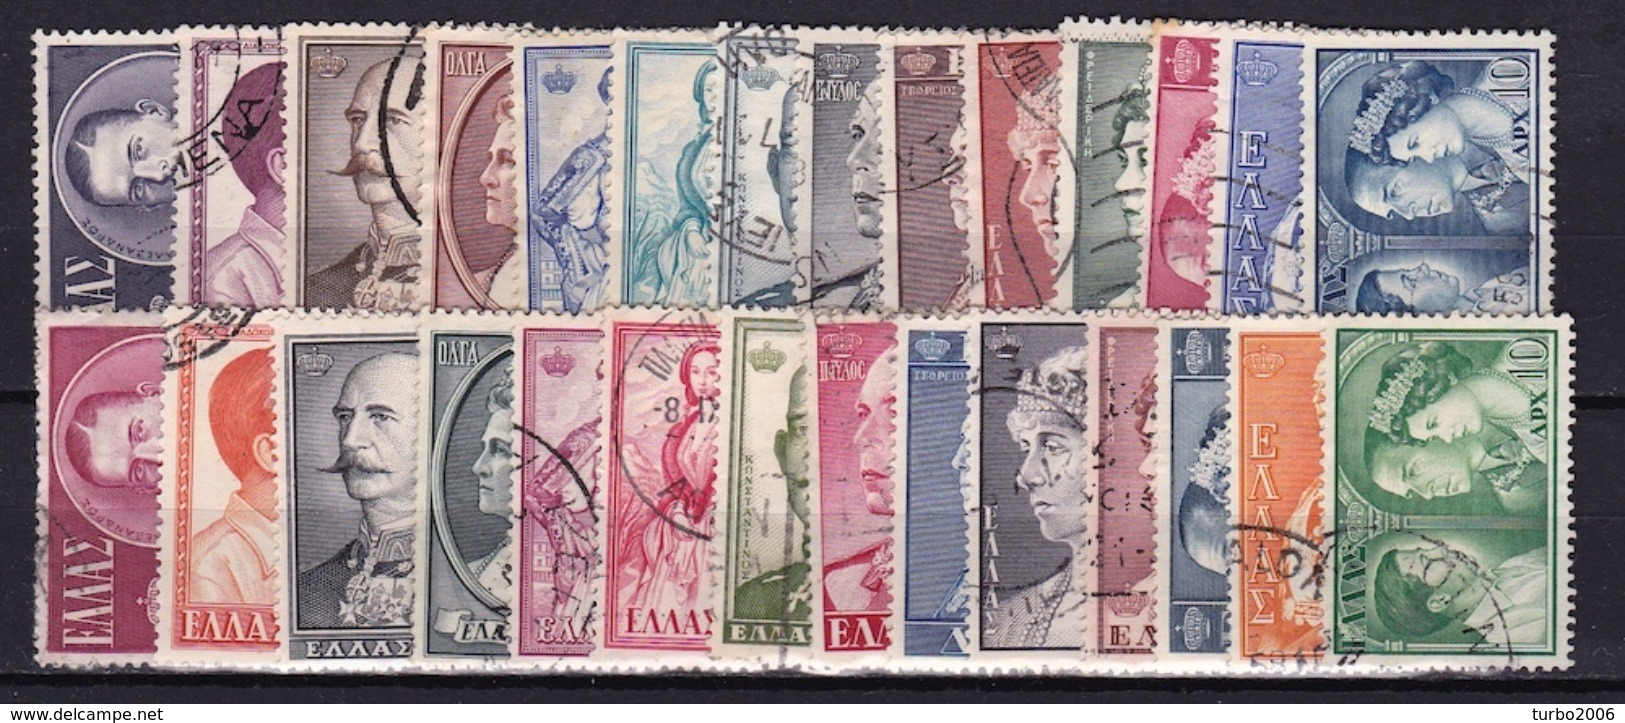 GREECE 1956-1957 Royal Family I + II 2 Complete Used Sets Vl. 709 / 722 + 726 / 739 - Griekenland